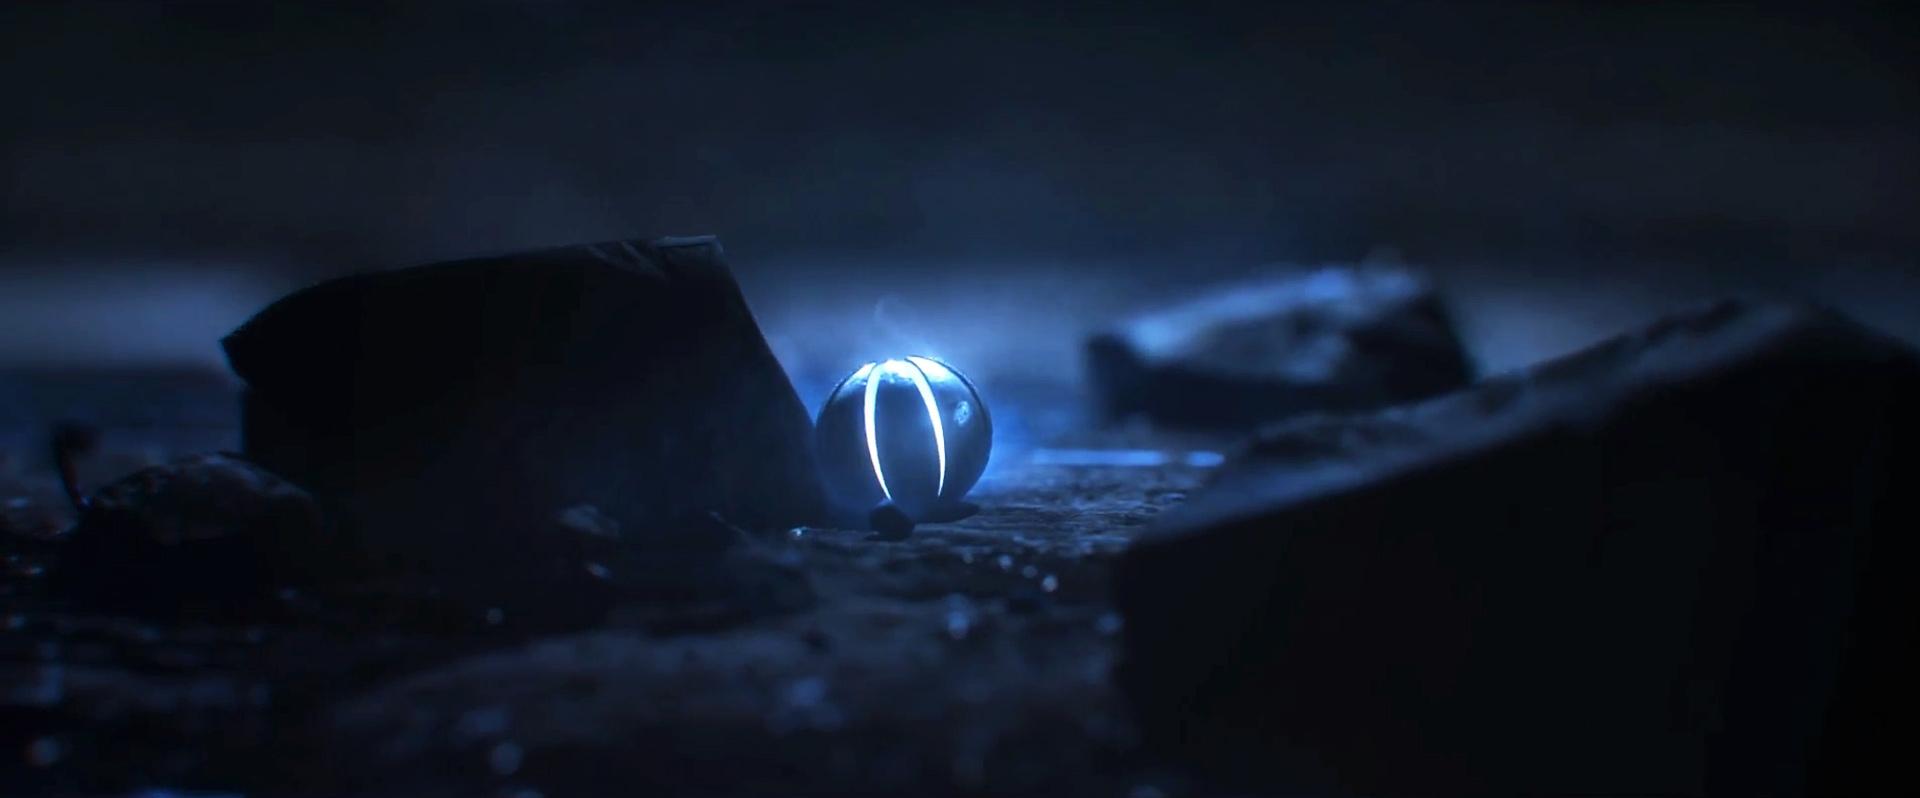 amazingly-cool-sci-fi-short-film-azarkant-11.jpg